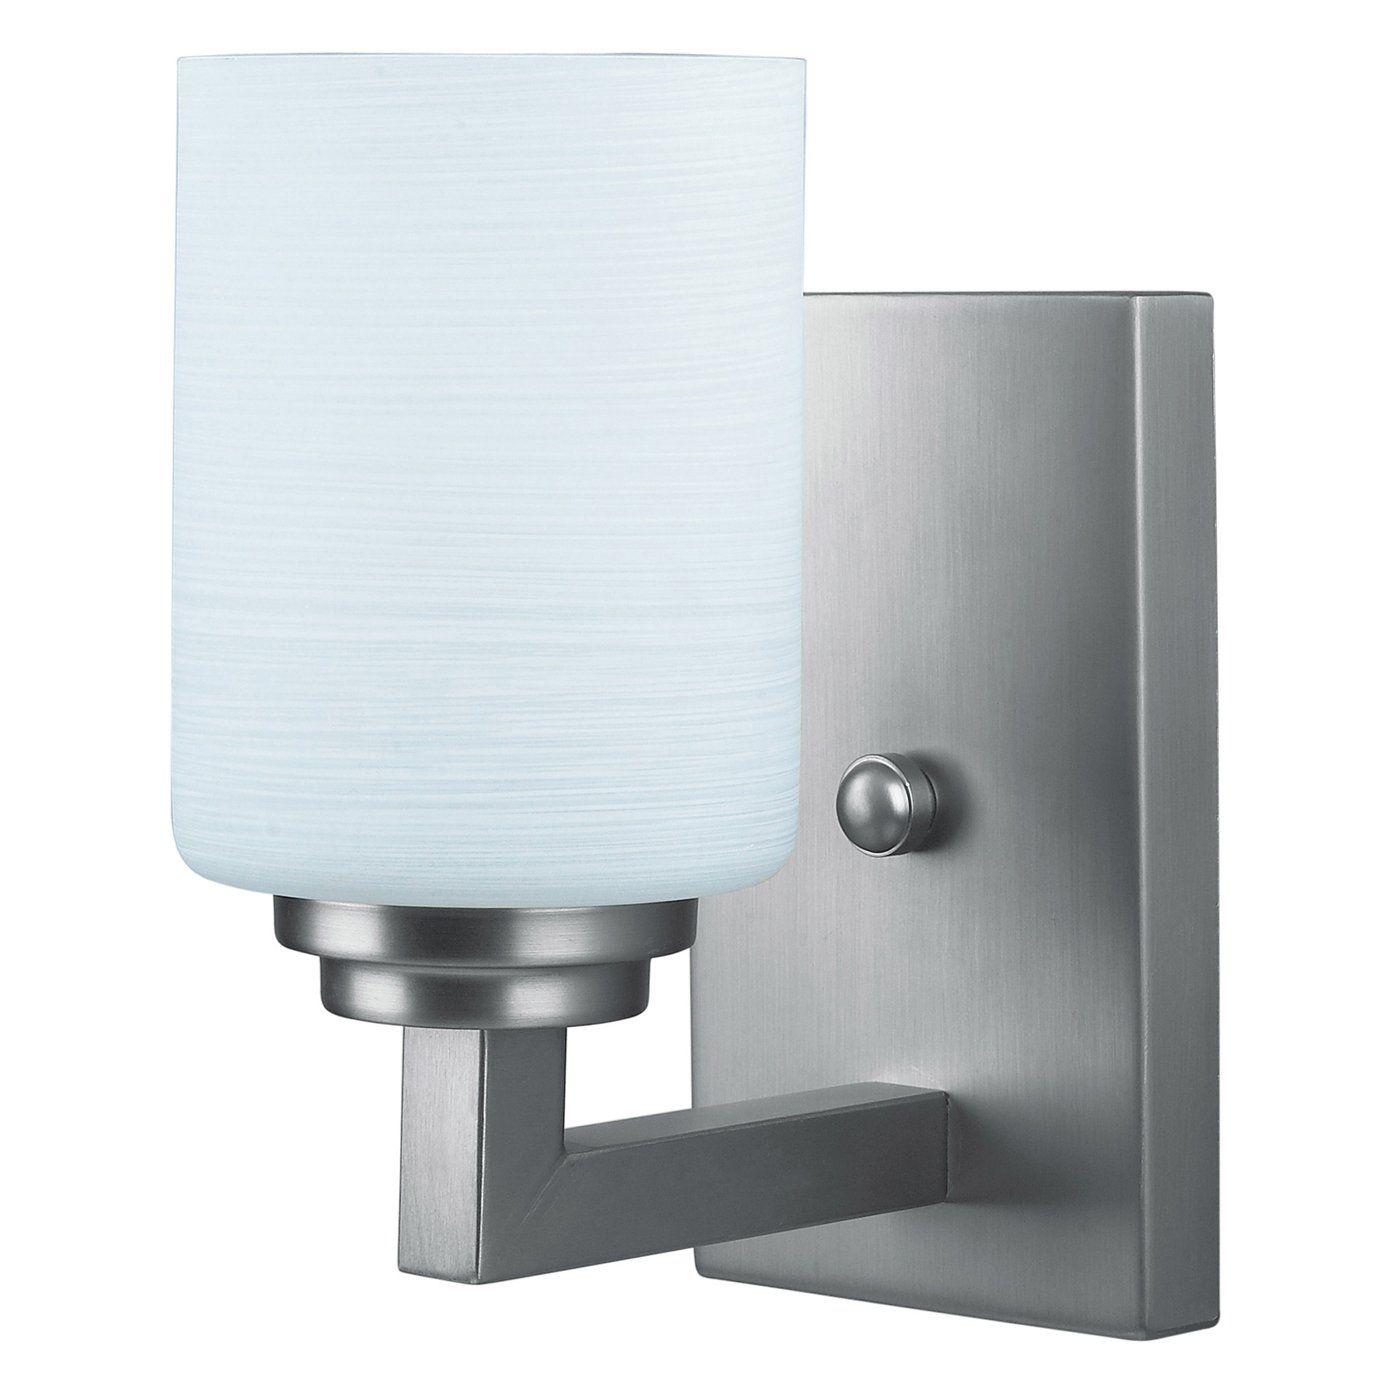 Efficient Master Bathroom And Walk In Closet: Canarm IVL902A01113 Carmen Energy